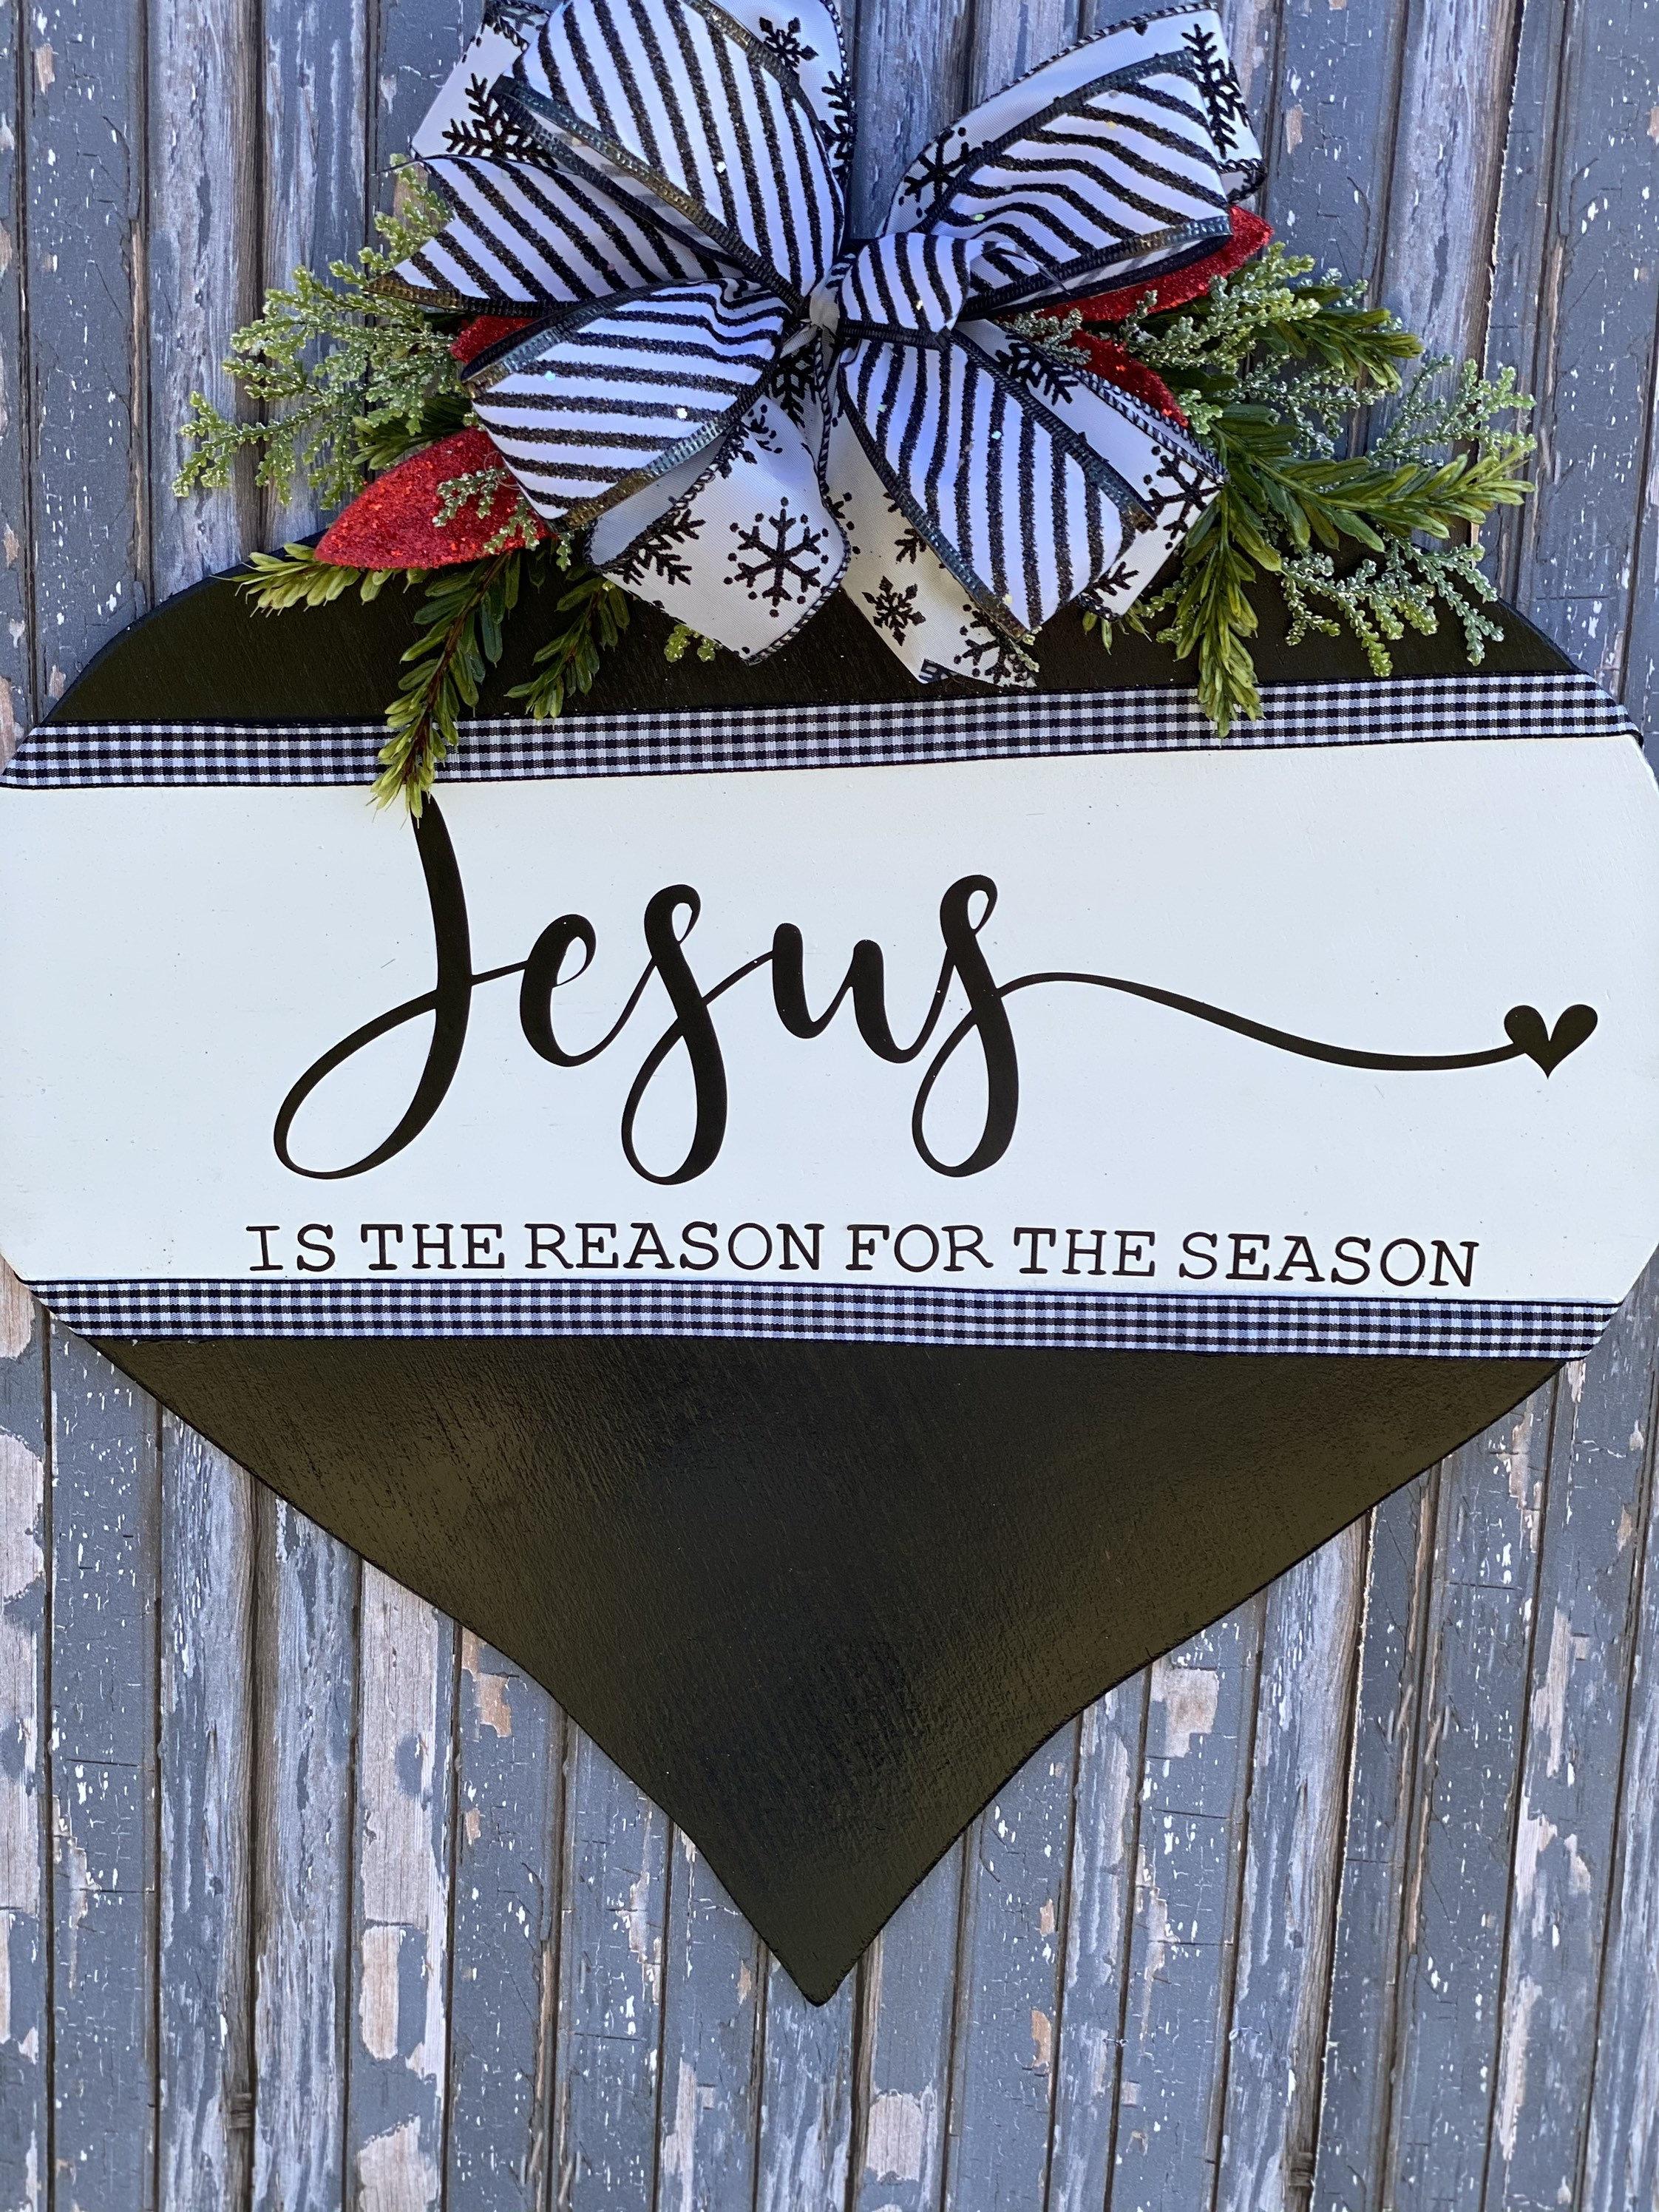 Christmas Door Hanger Holiday Wall Decor Buffalo Plaid Christmas Decor Jesus Is The Reason Christmas Wreath Christmas Front Door Decor